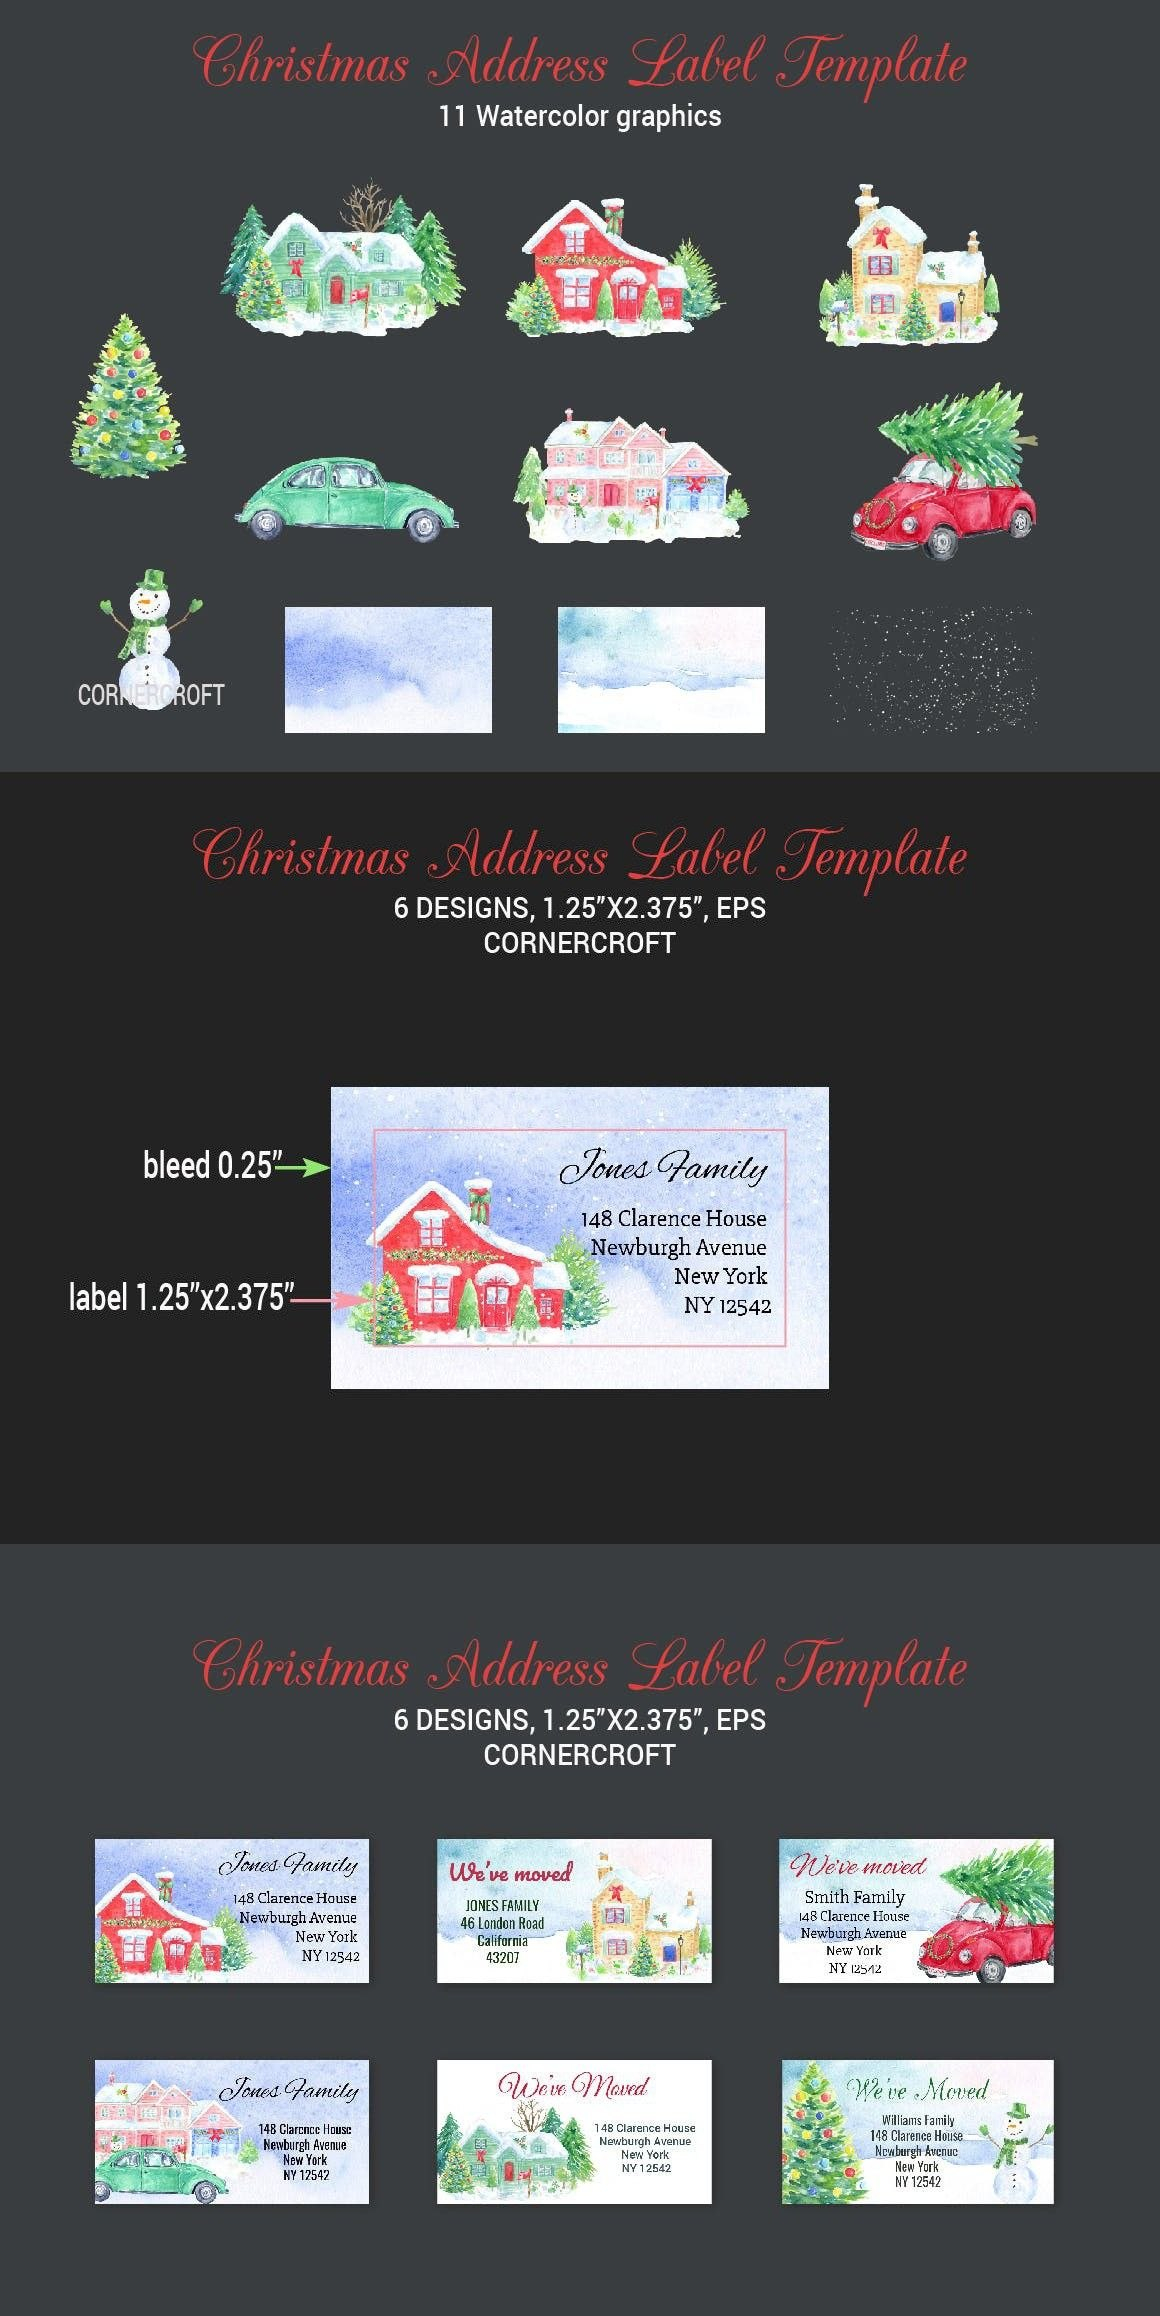 Christmas Address Label Template  Print Templates  Christmas Regarding Christmas Address Labels Template